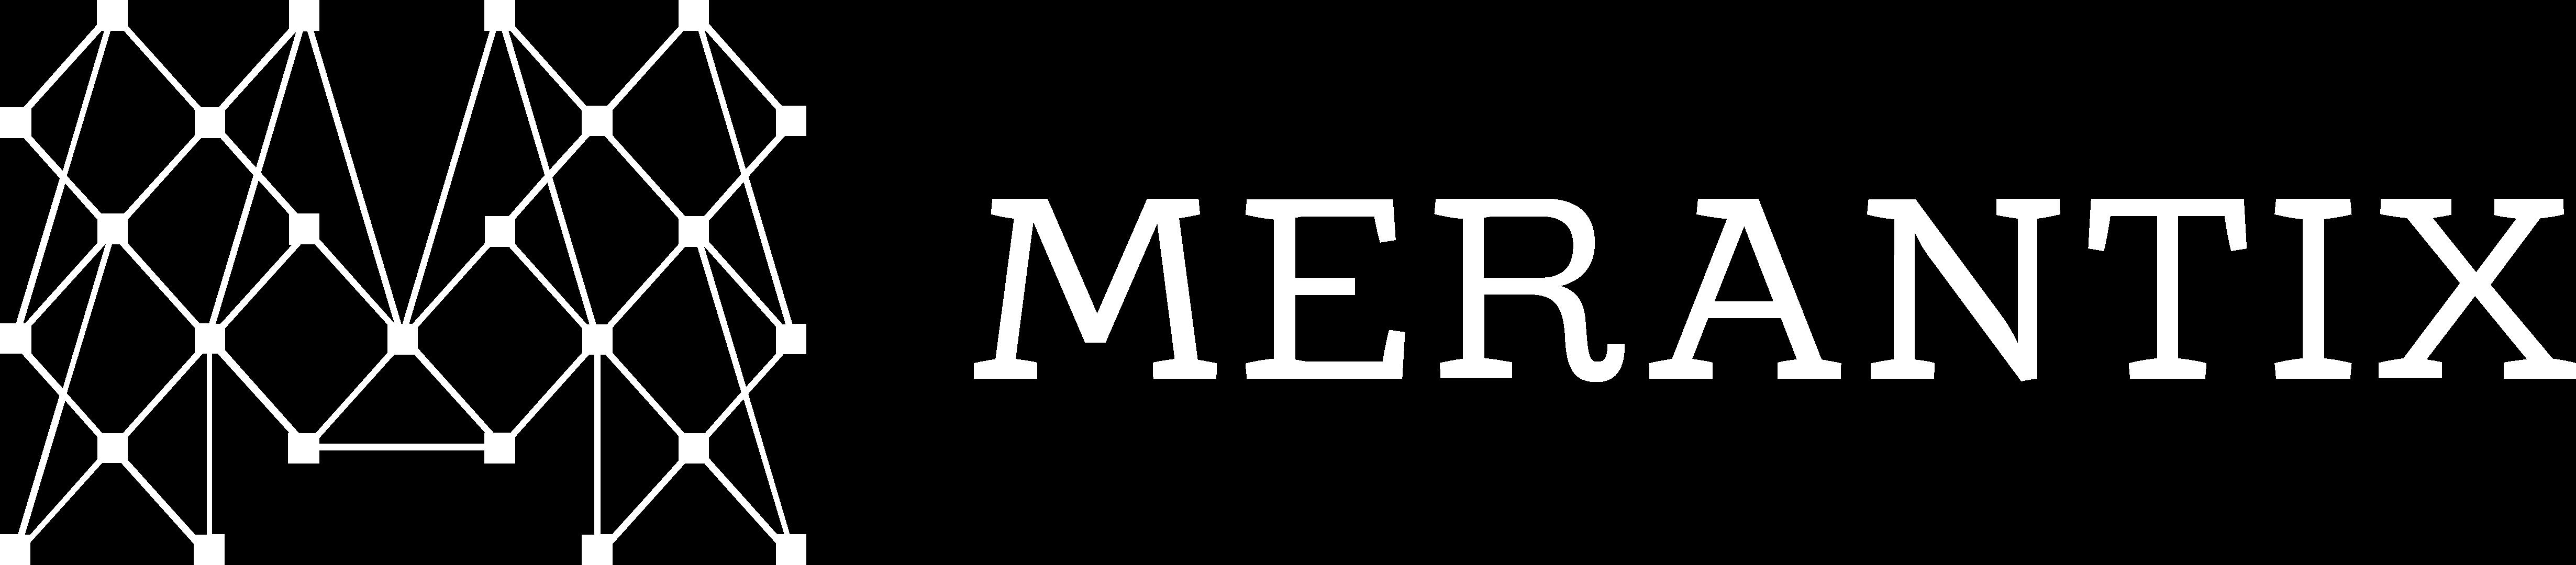 merantix-logo-black 1-1